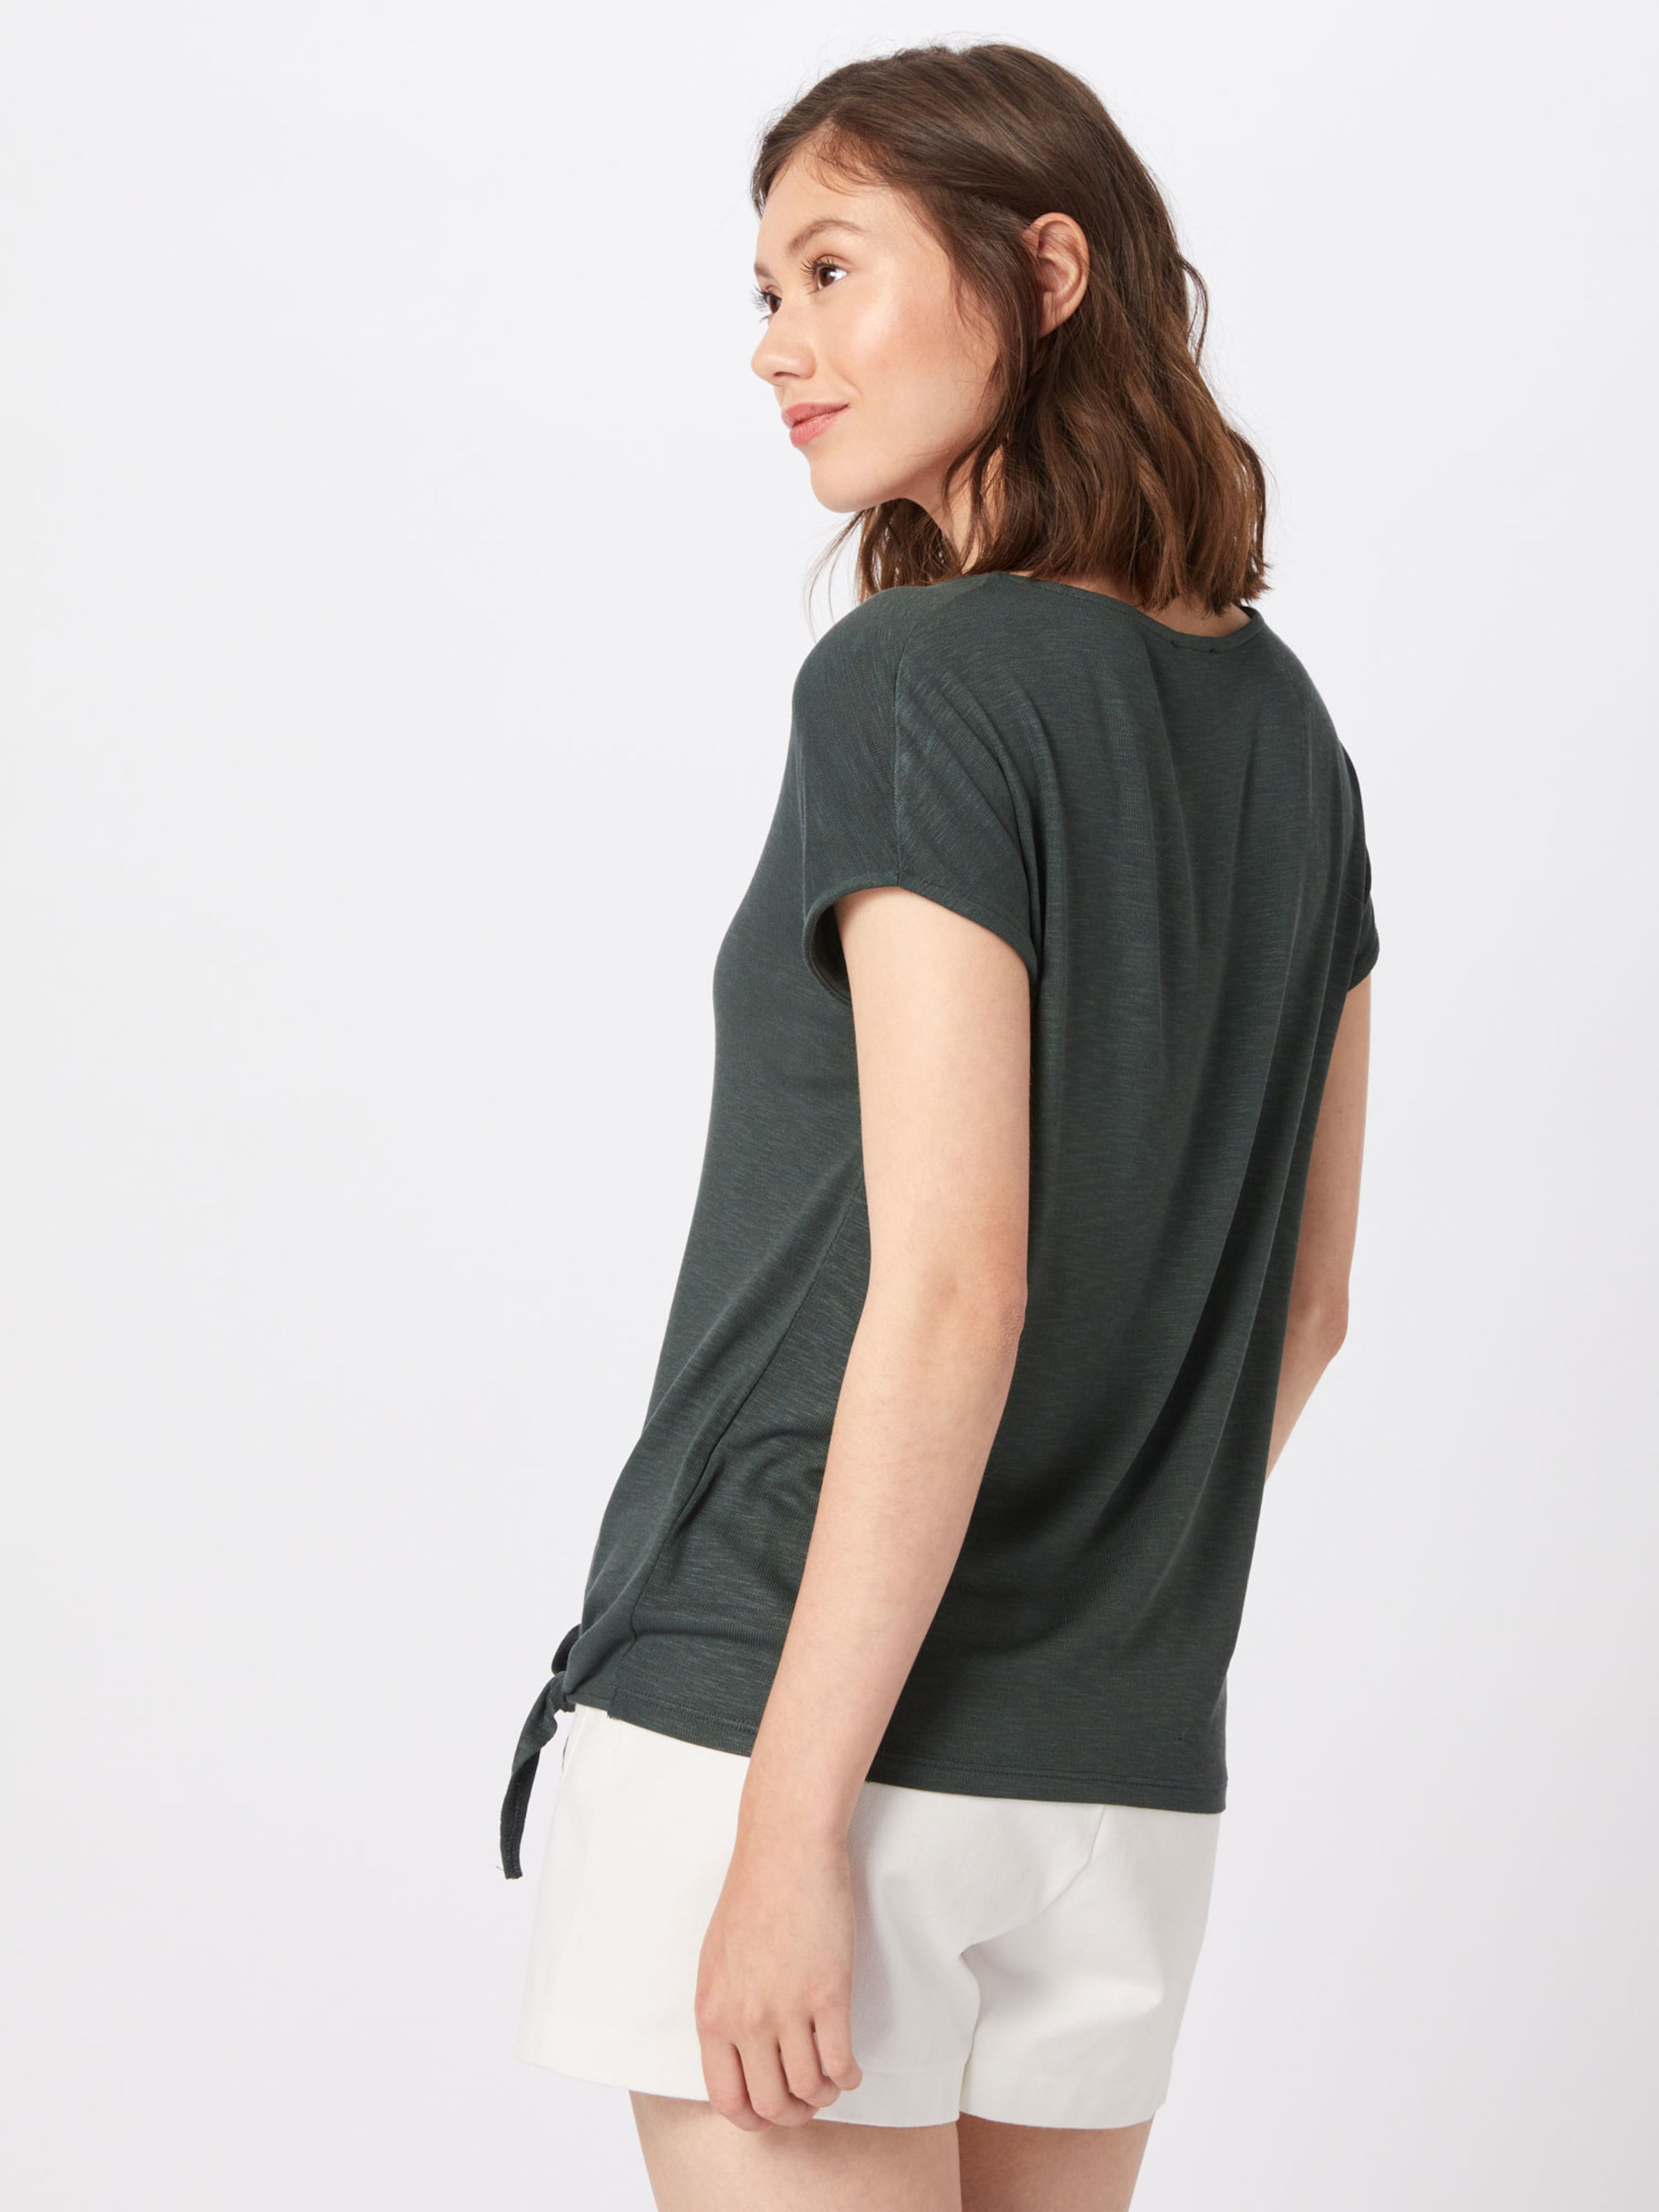 Femke' Vert One 'qr Foncé En T Street shirt CWderBxo